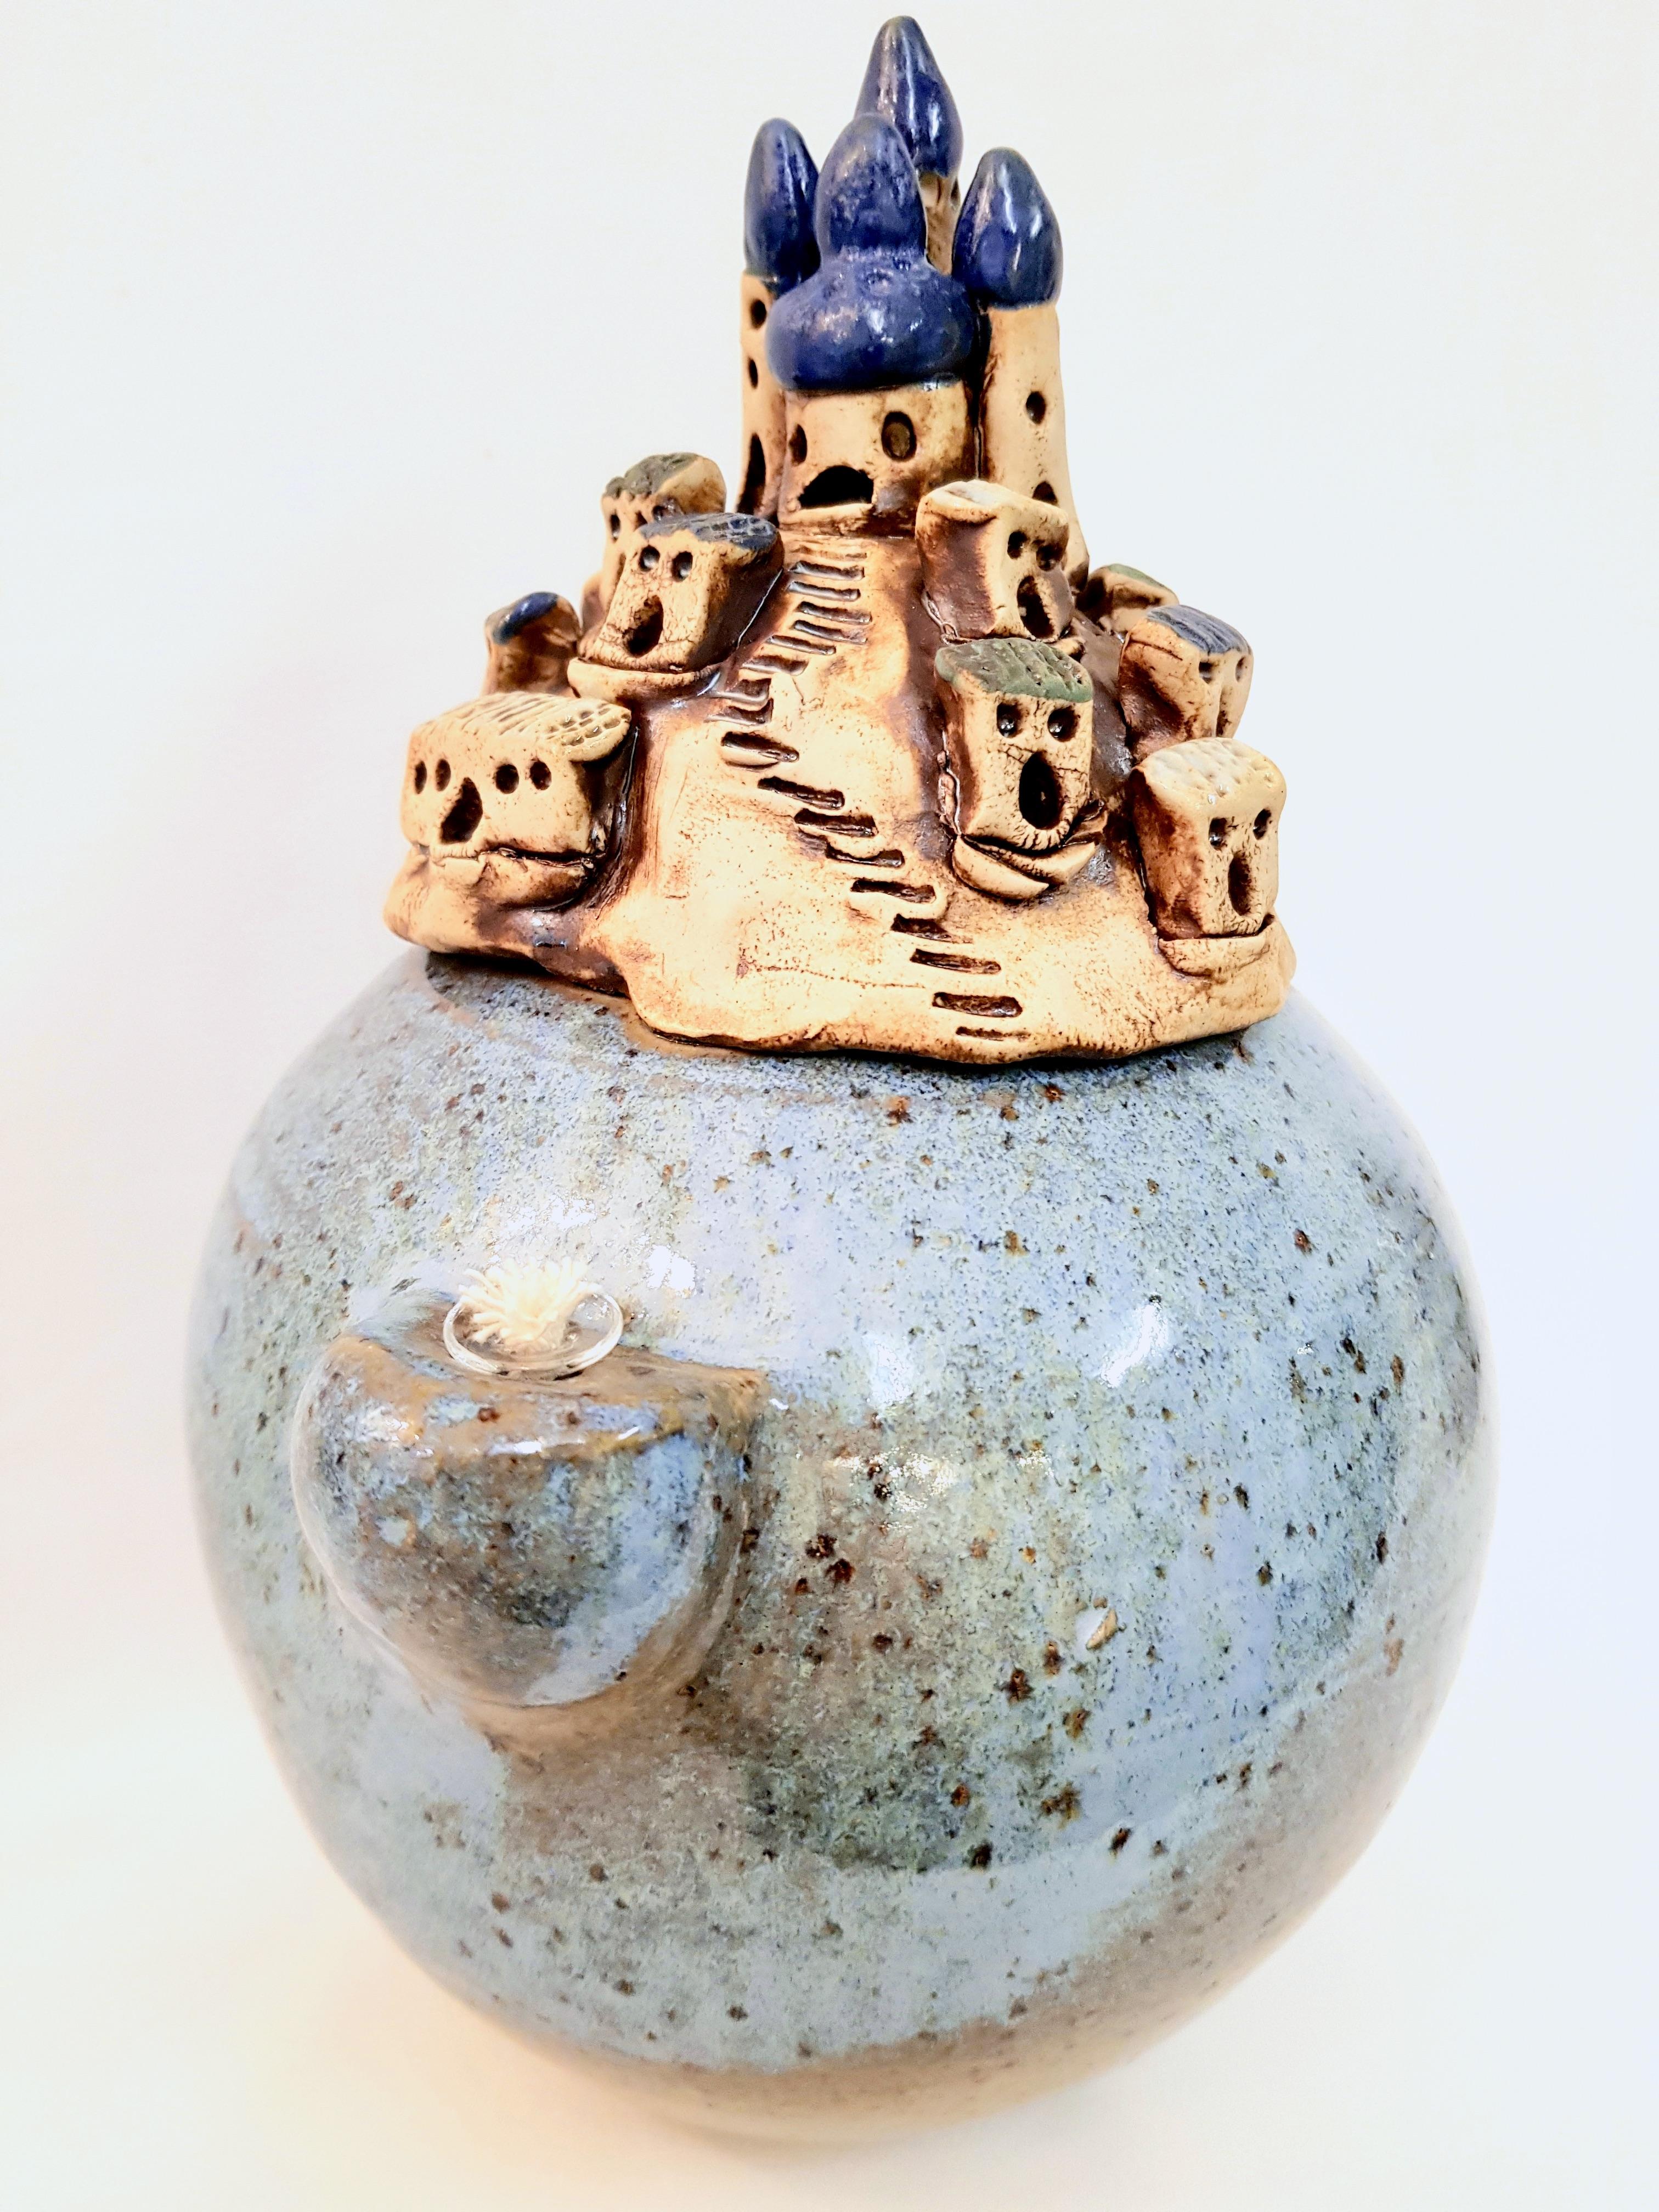 Oellampe Keramik, Unikat, handgedreht, La Ceramica Basel, Töpferei, online-shop, Kurse, Teamevent